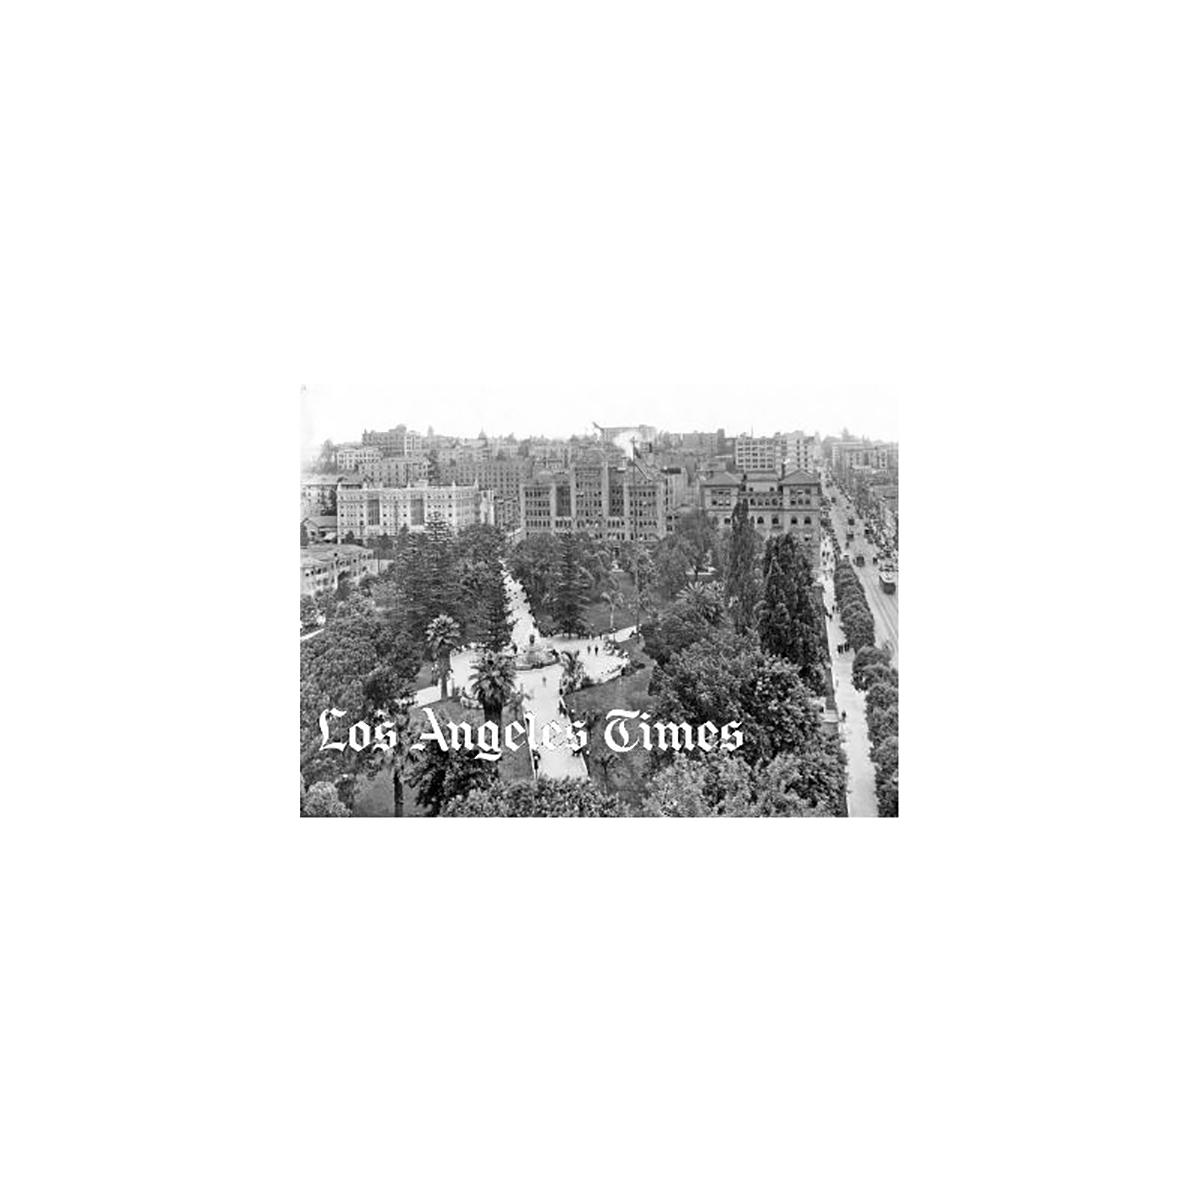 Historical Pershing Square Photo